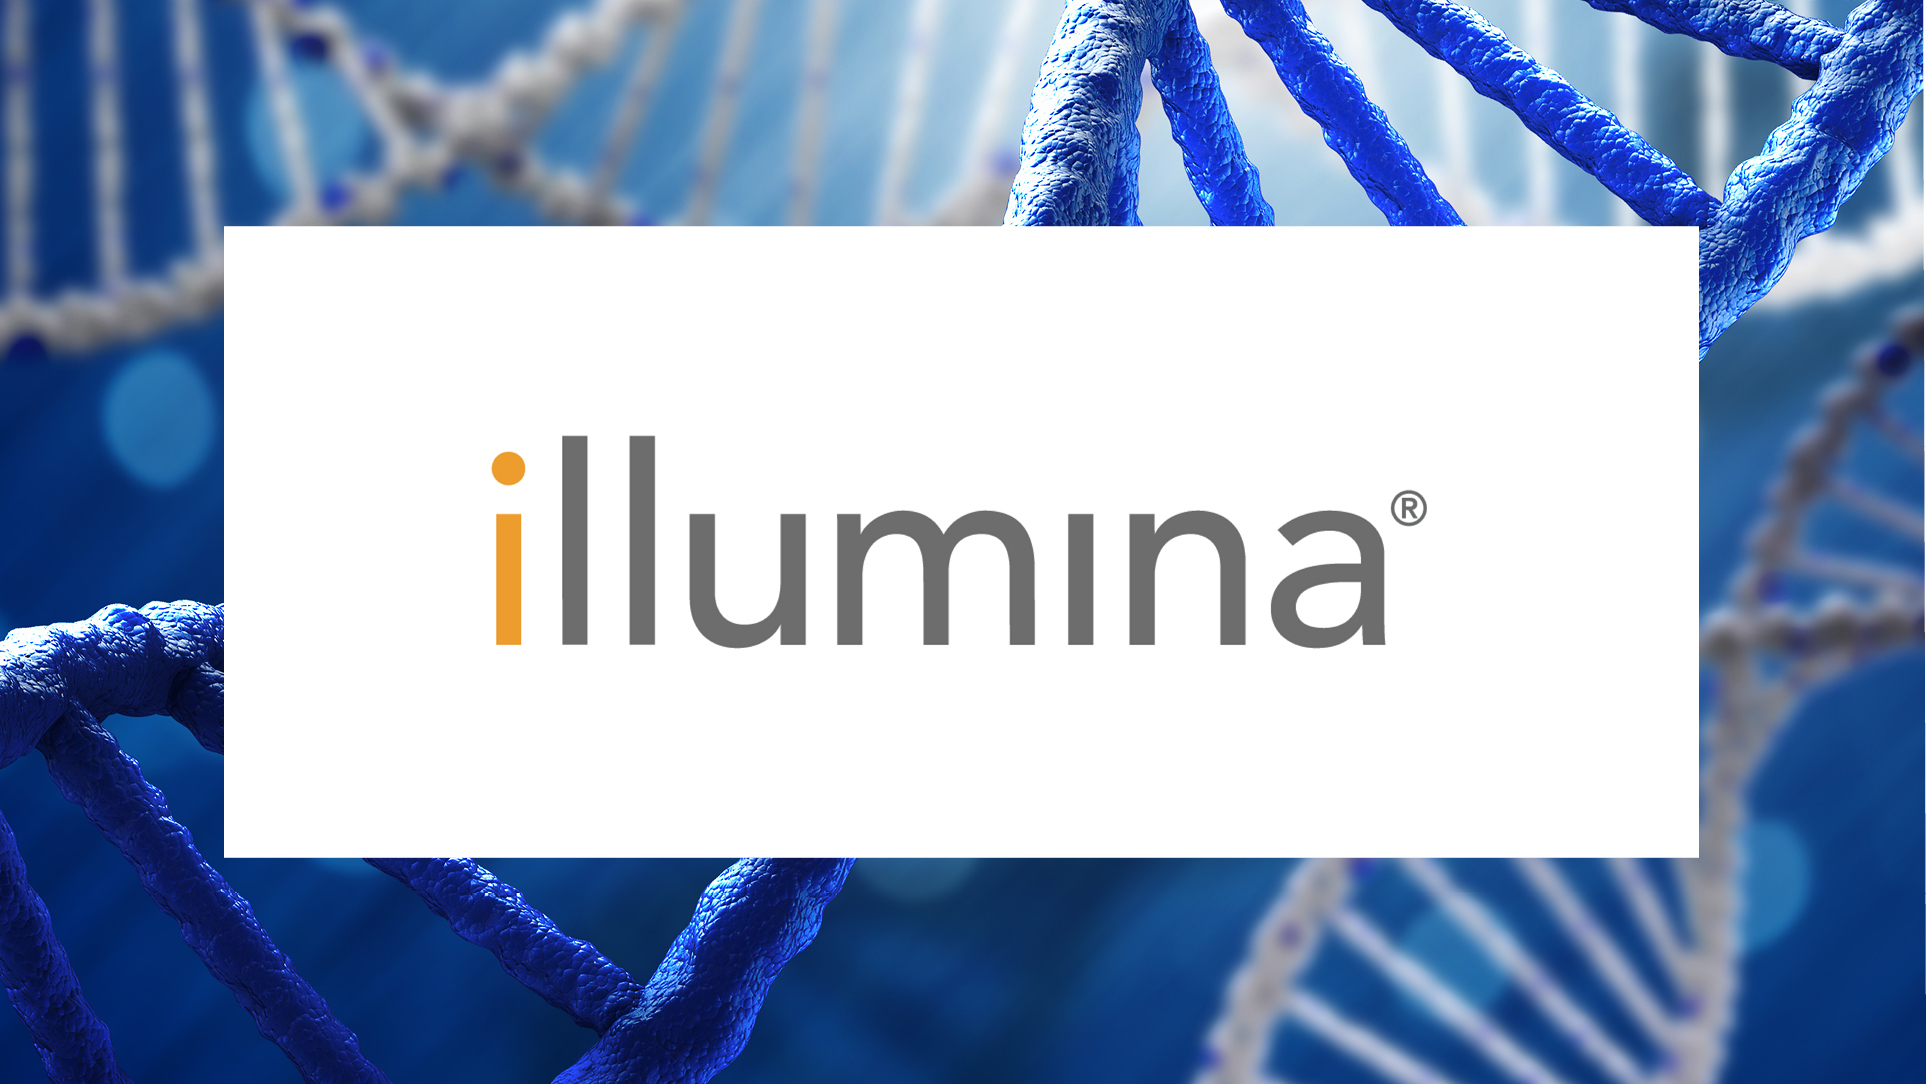 19-014 Illumina Case Study OG 1926x1084 v1.jpg